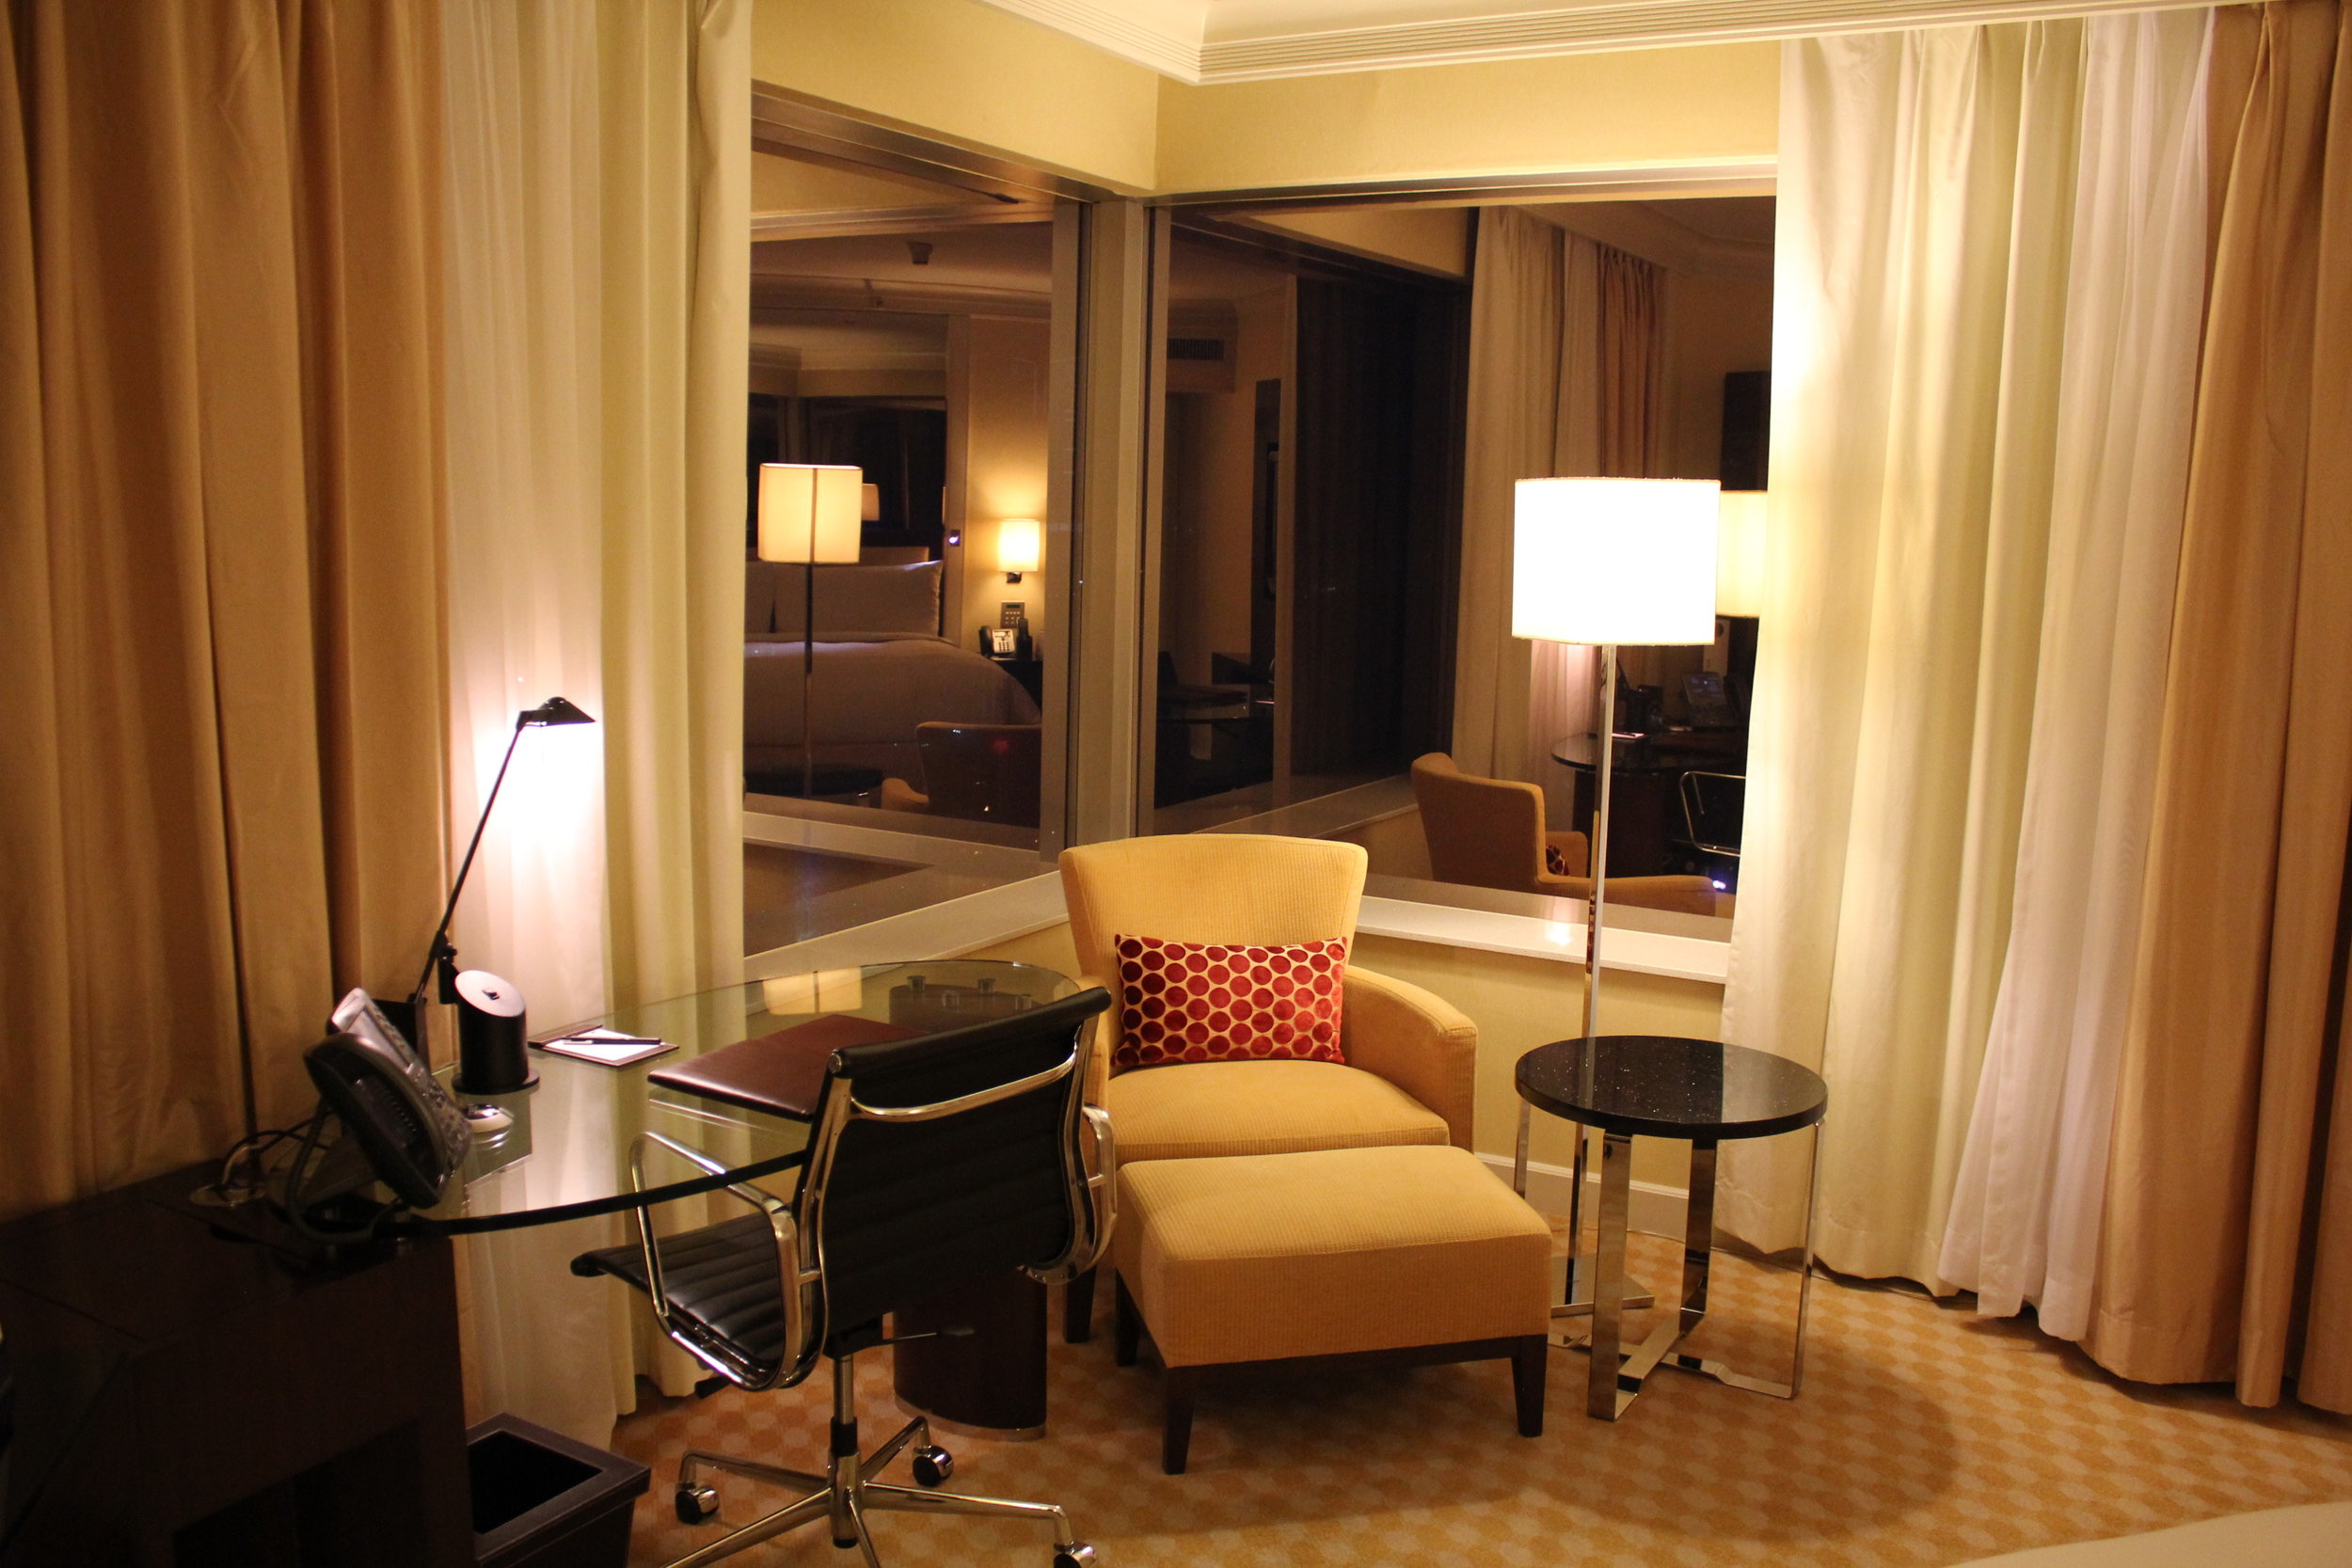 JW Marriott Hong Kong – Room